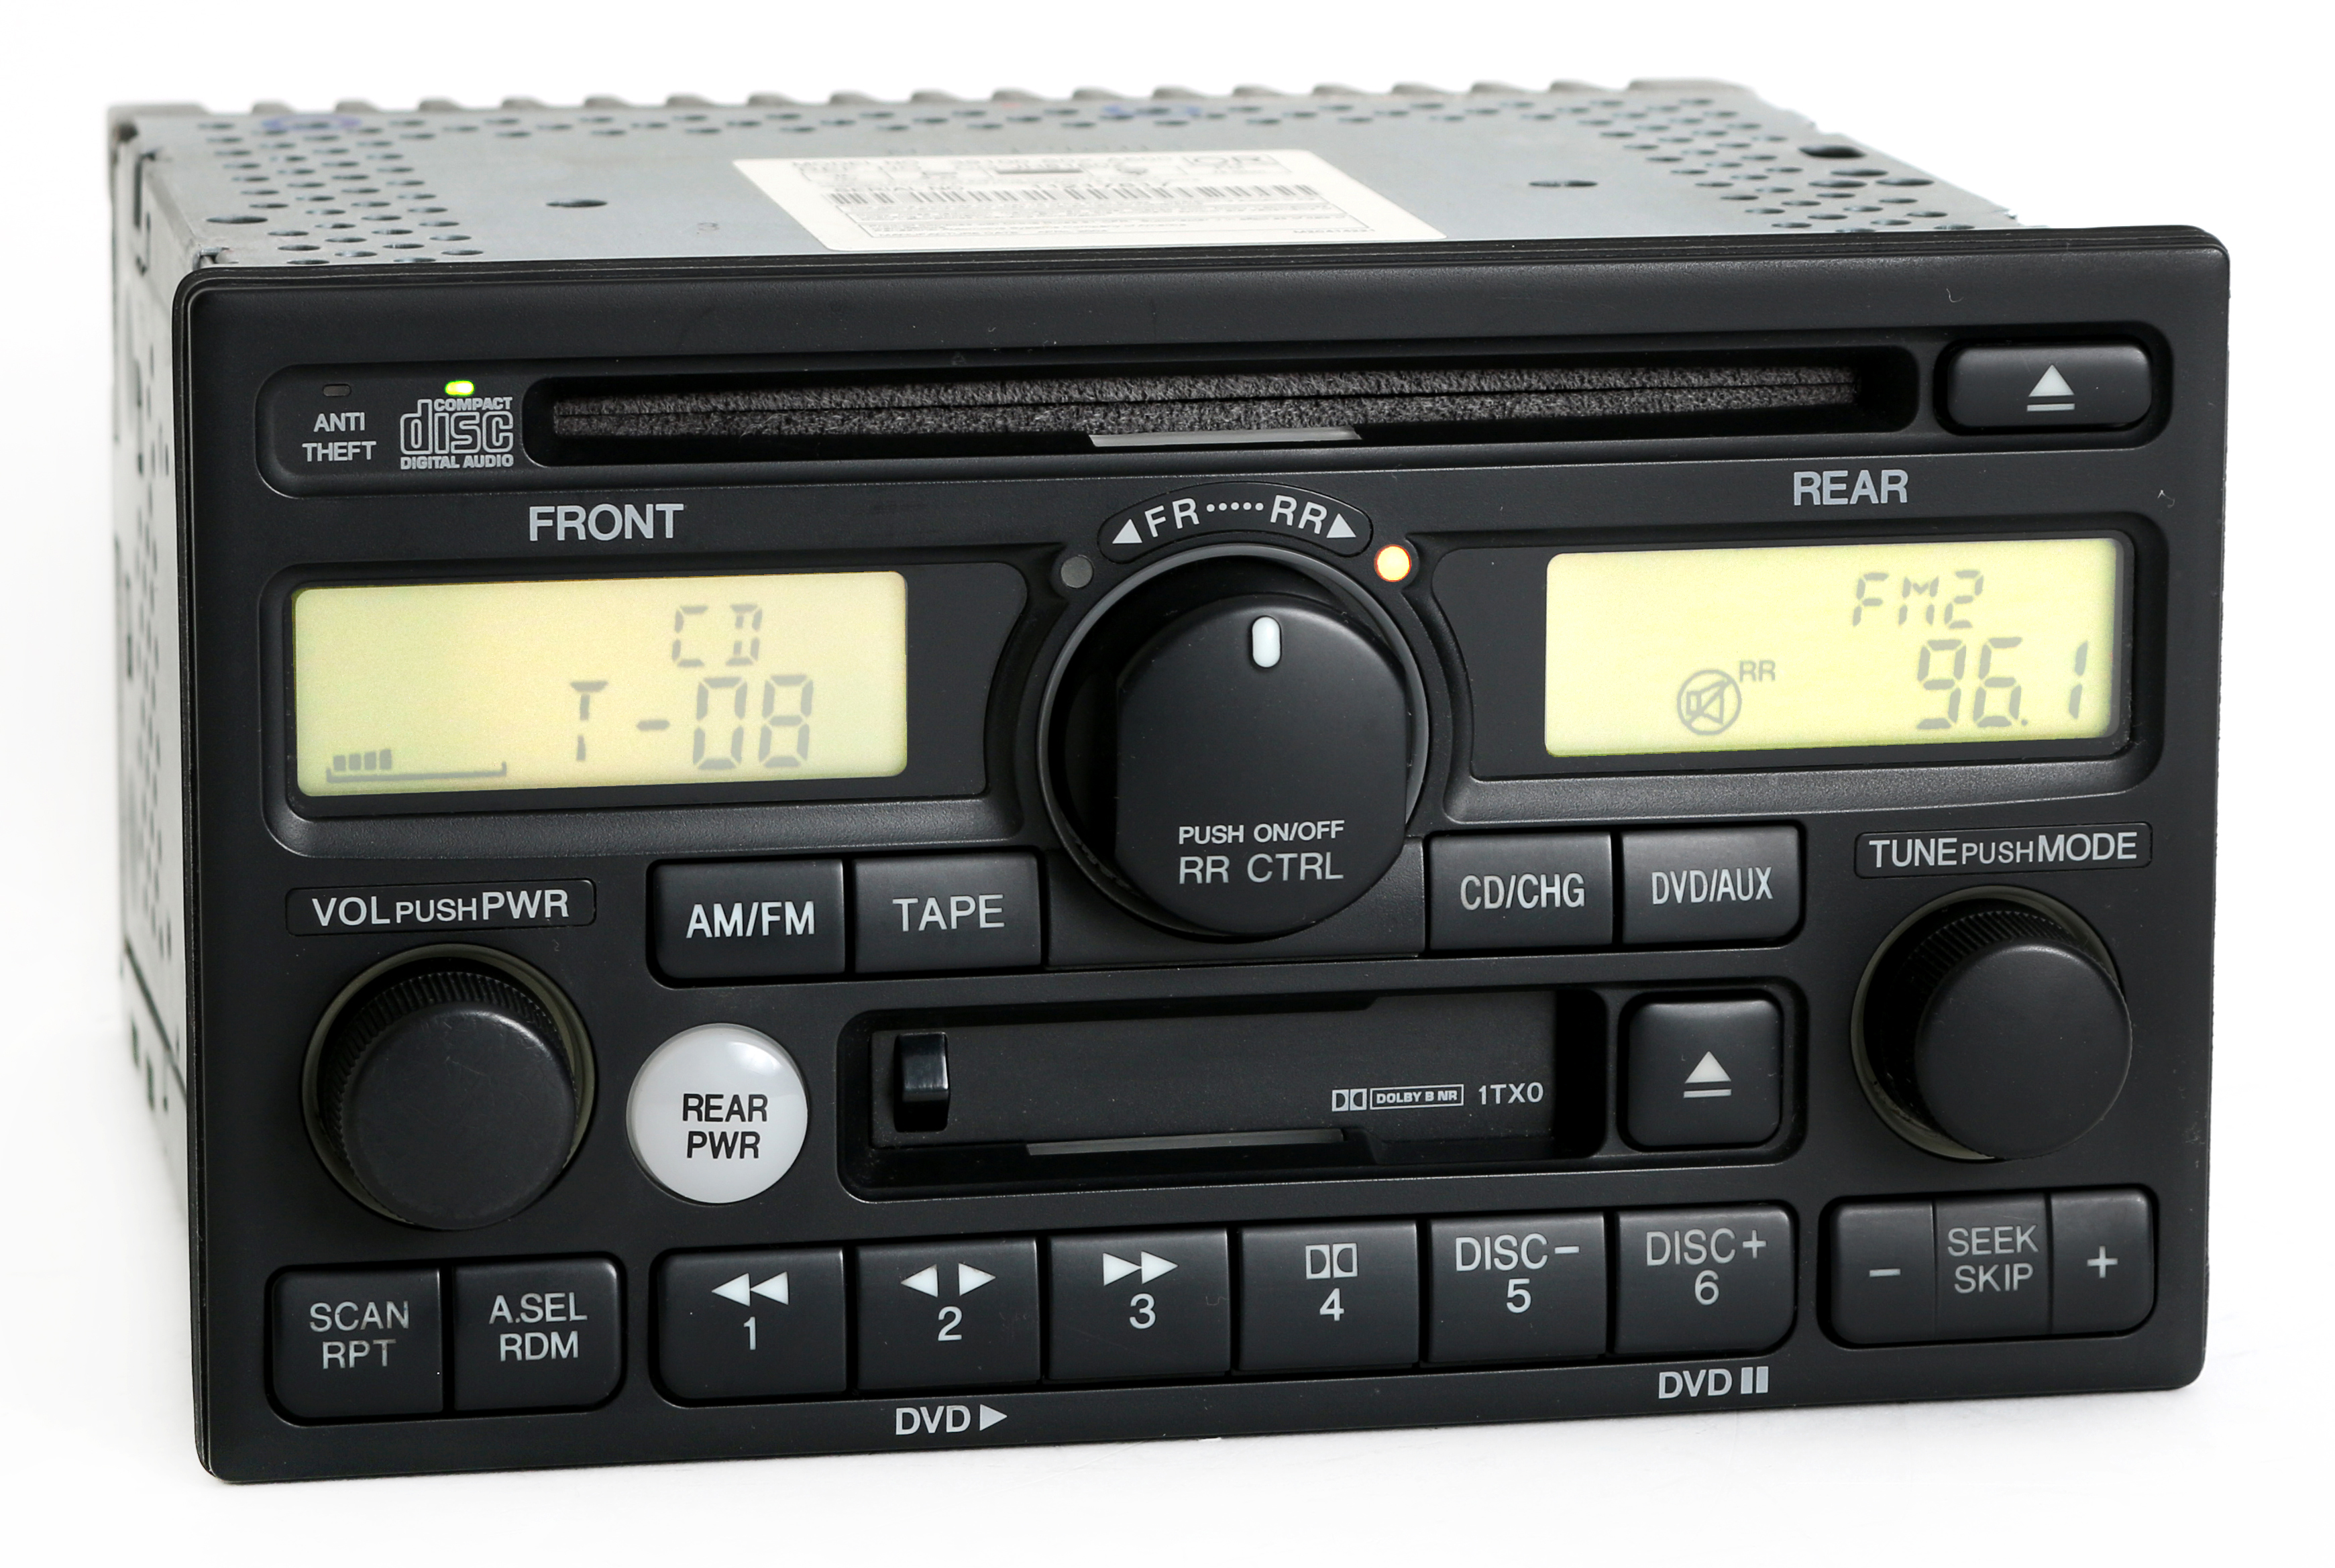 Honda Odyssey EX-L 2002-04 Radio AM FM CD Cassette Player PN 39100-S0X-A500 1TX0 Refurbished by Honda